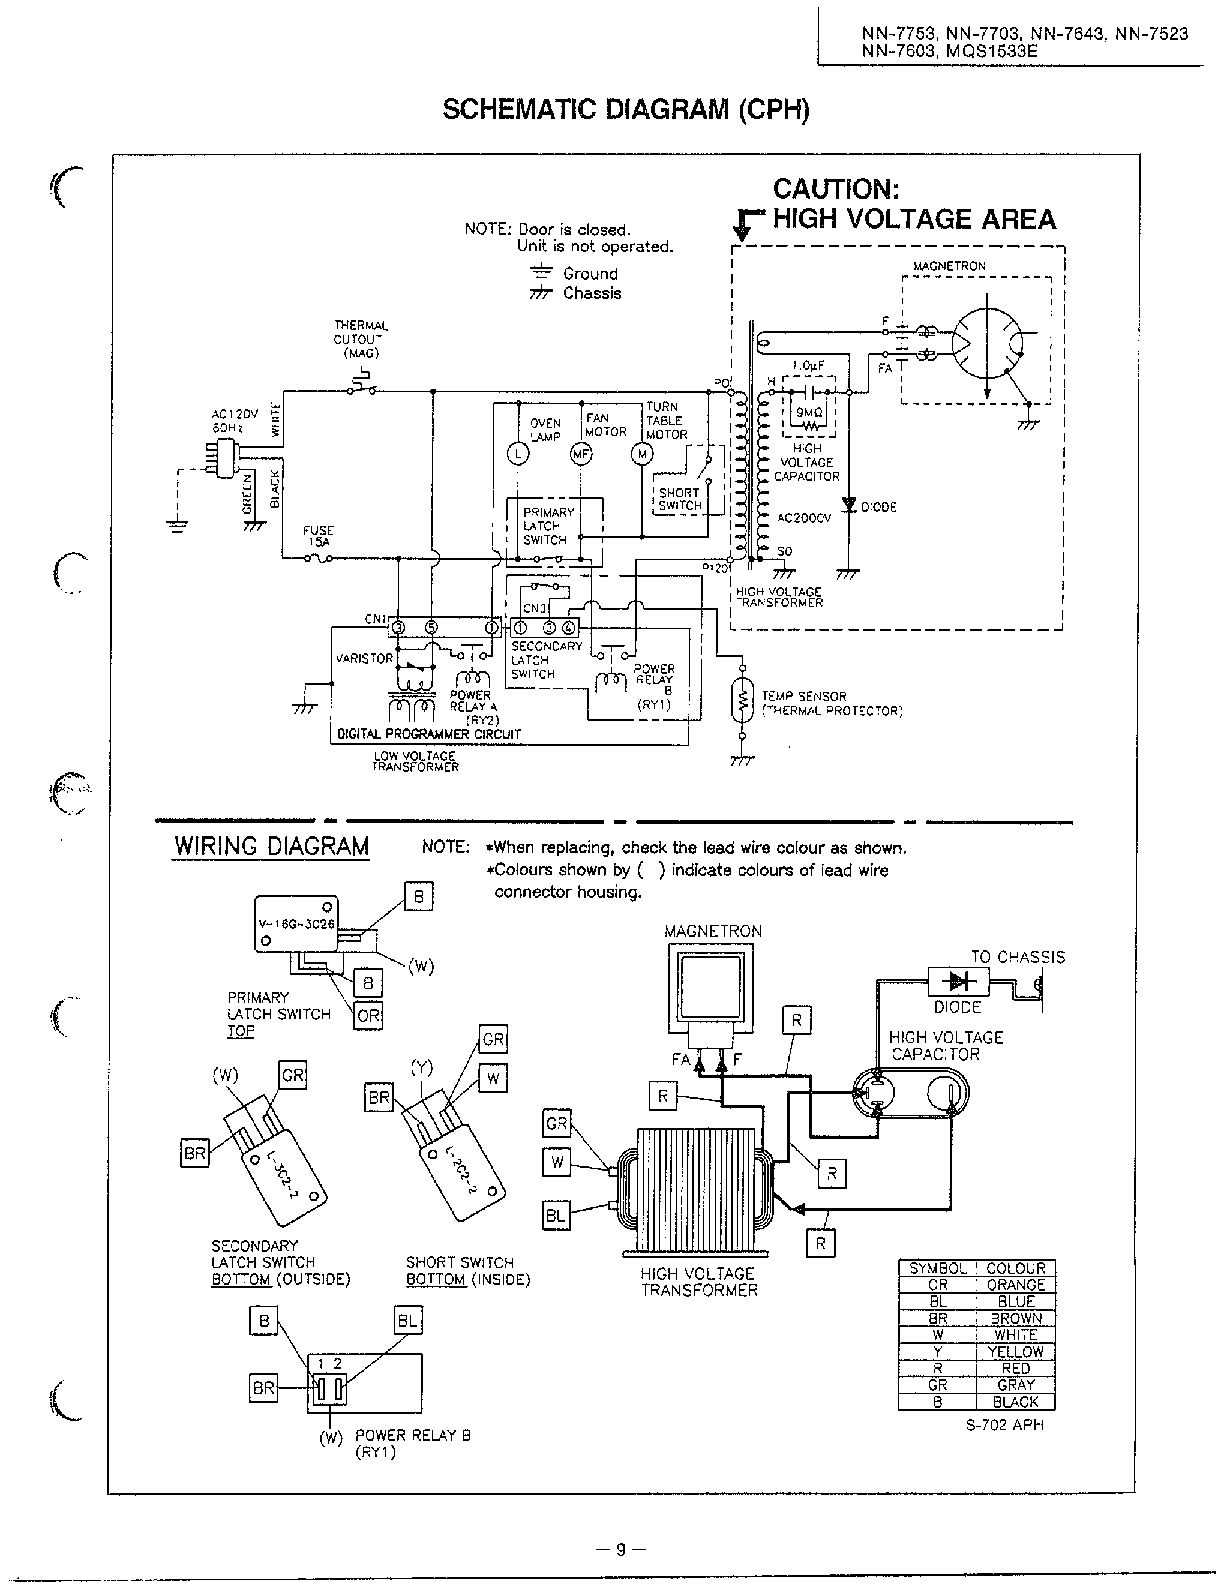 hight resolution of panasonic panasonic microwave oven parts model nn 7753 sears panasonic microwave oven schematic diagram